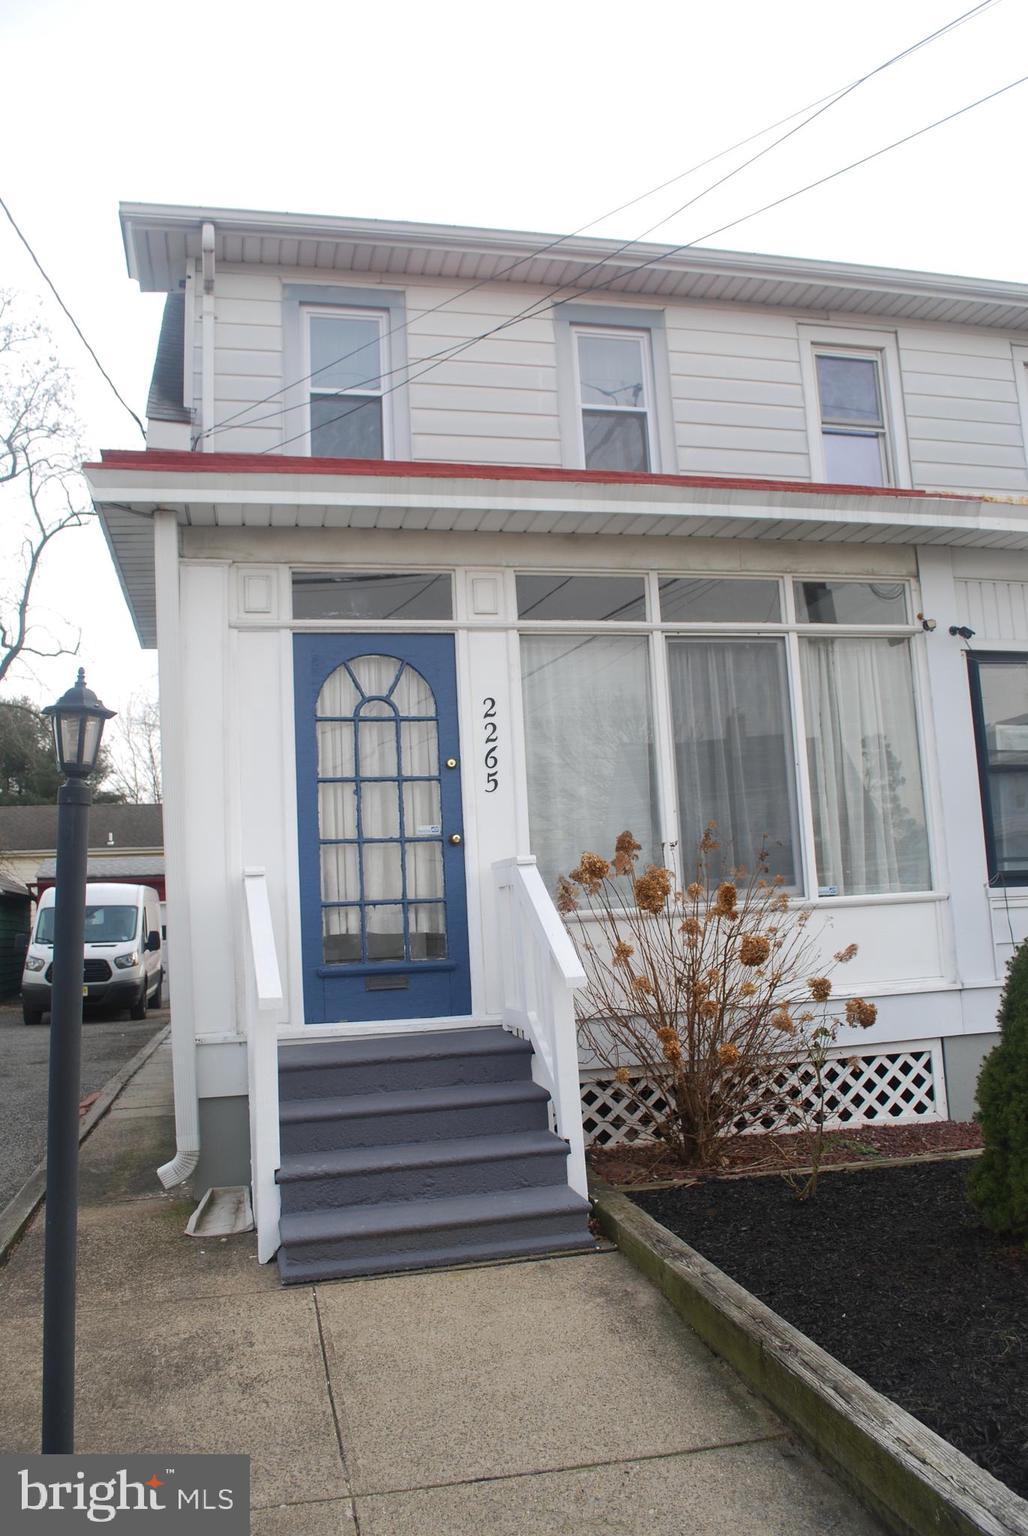 2265 LIBERTY STREET, HAMILTON, NJ 08629